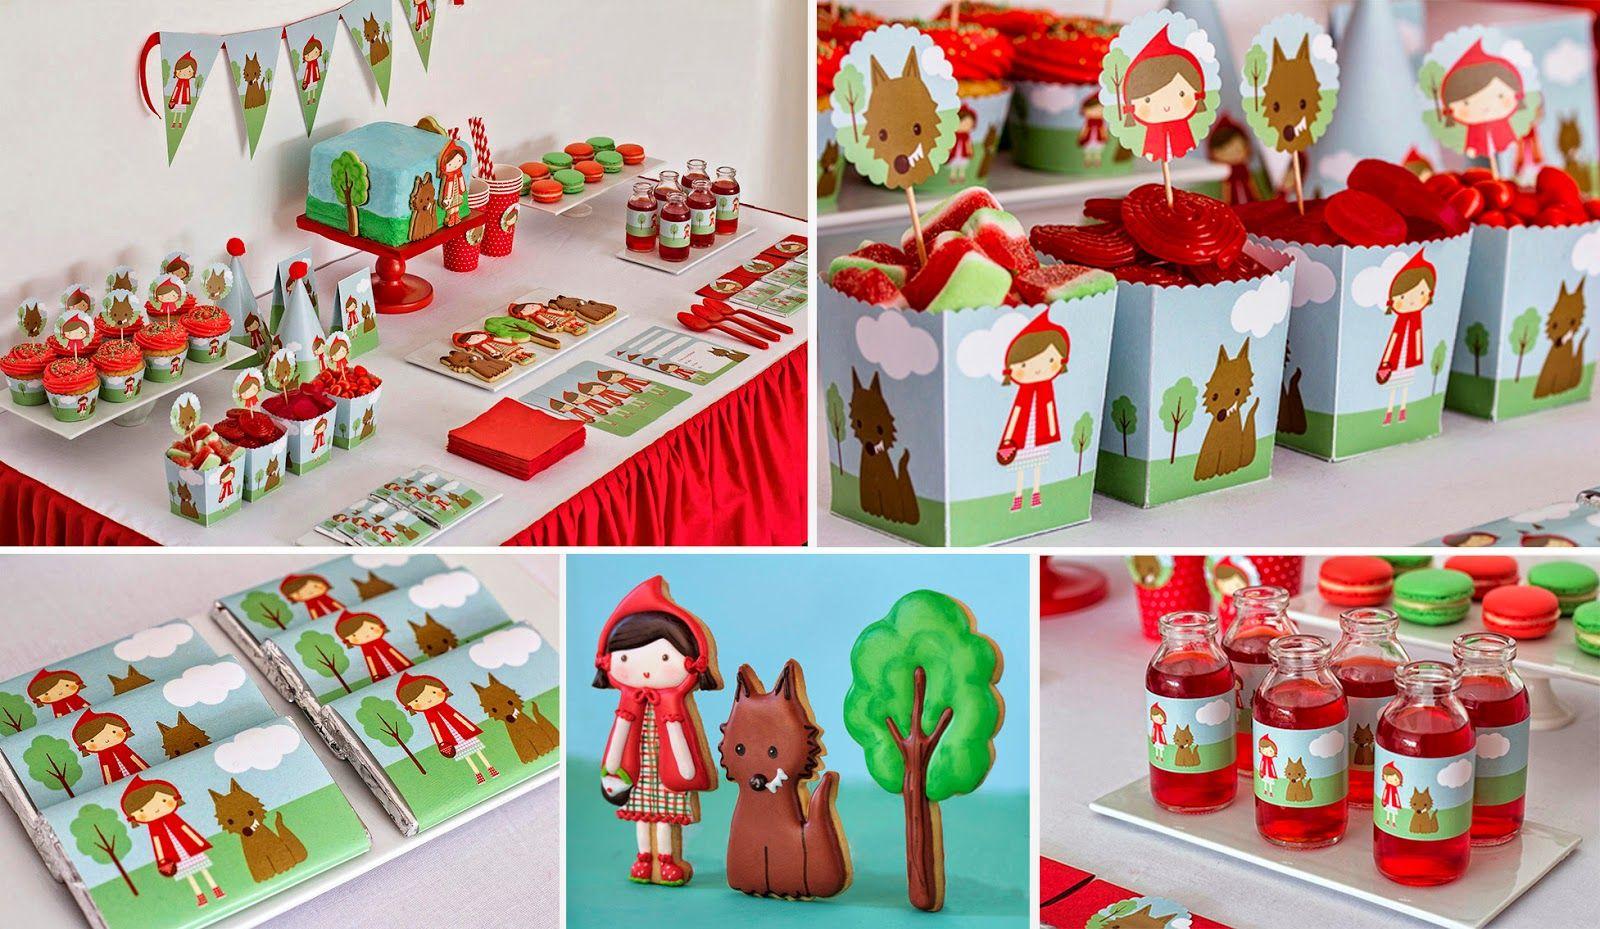 fiesta cumpleaos fiestas temticas caperucita roja fiestas infantiles galletas decoradas dulce vida tartas fondant ideas originales mesas dulces